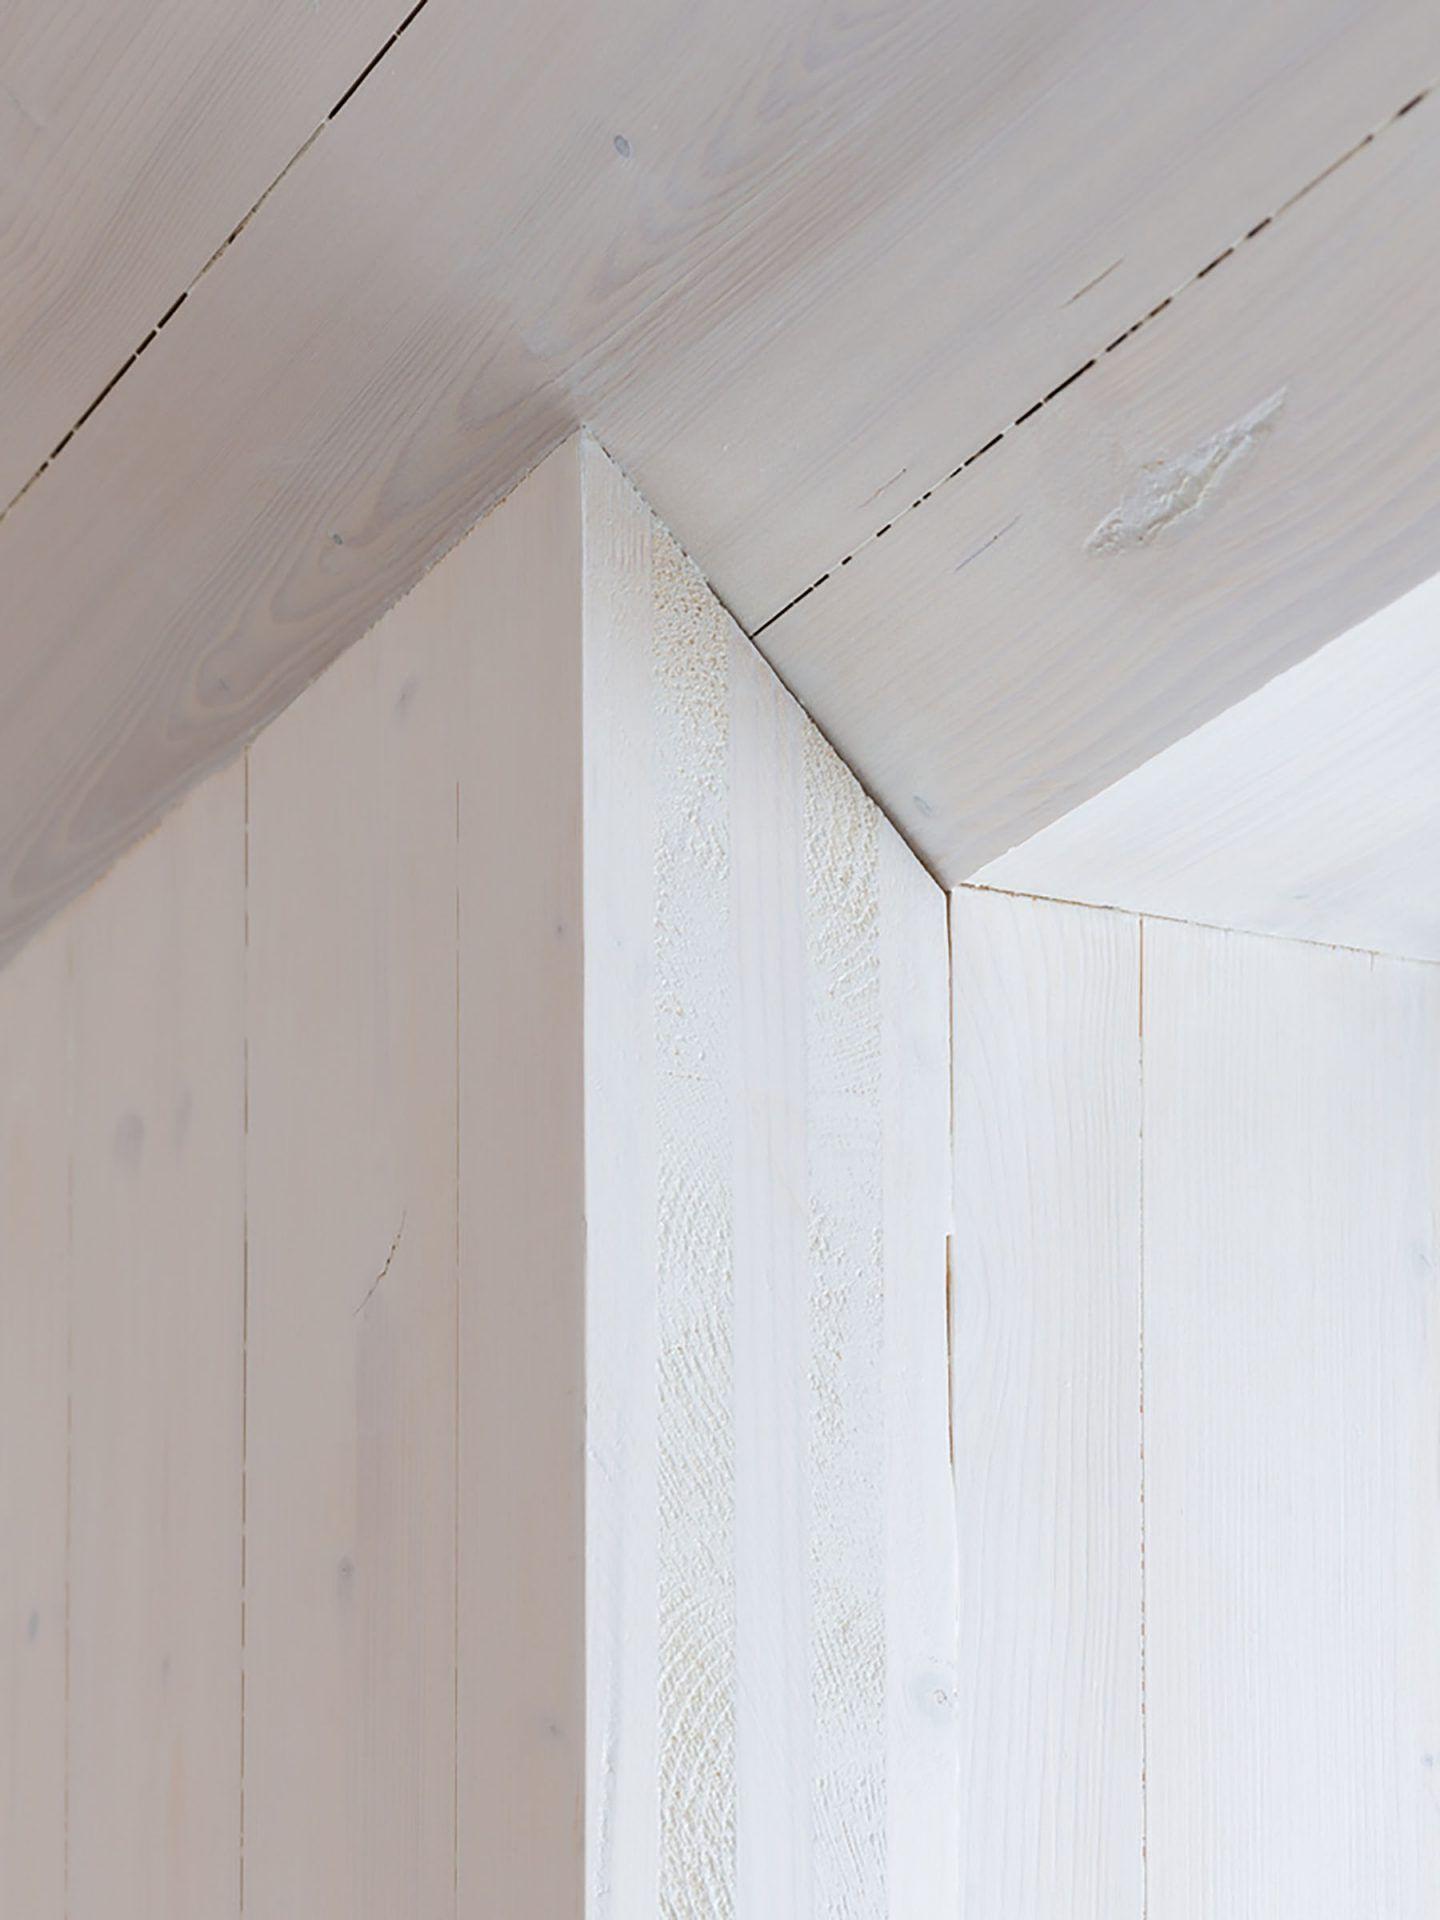 IGNANT-Architecture-Jim-Brunnestom-Dalsland-Cabin-2.0-7